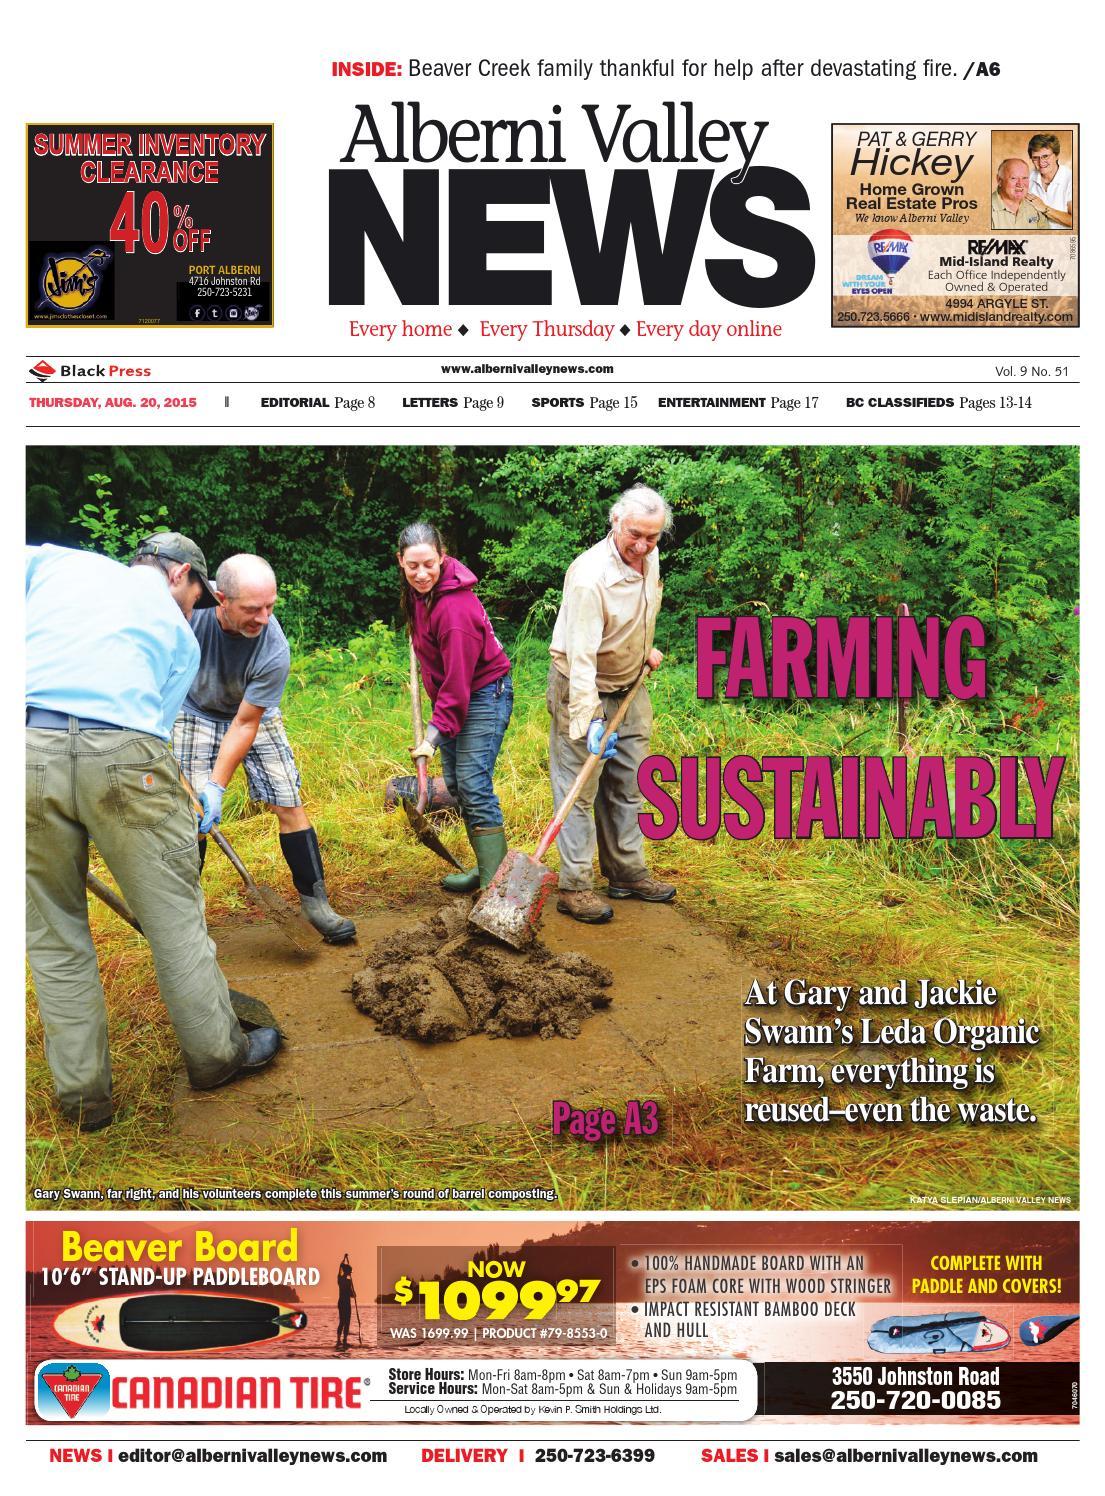 Alberni Valley News, August 20, 2015 by Black Press Media